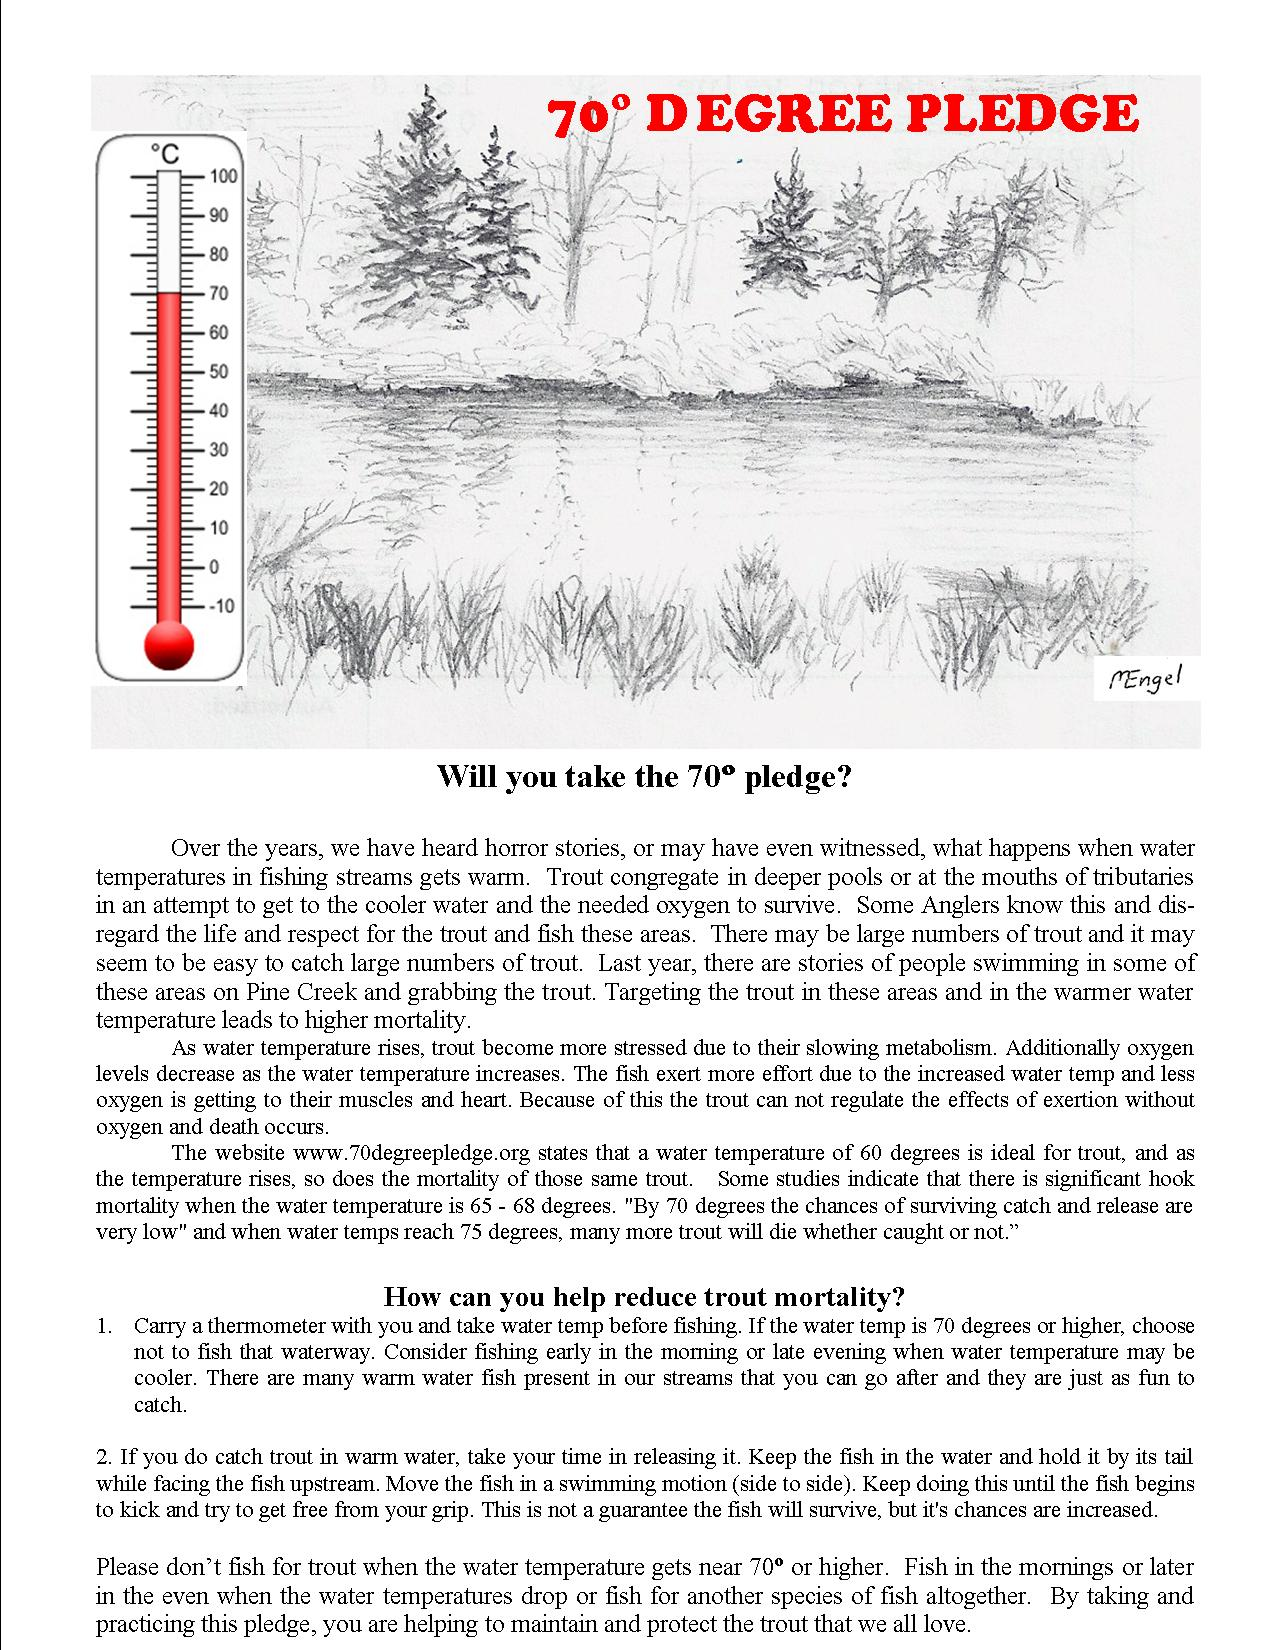 70 degree pledge